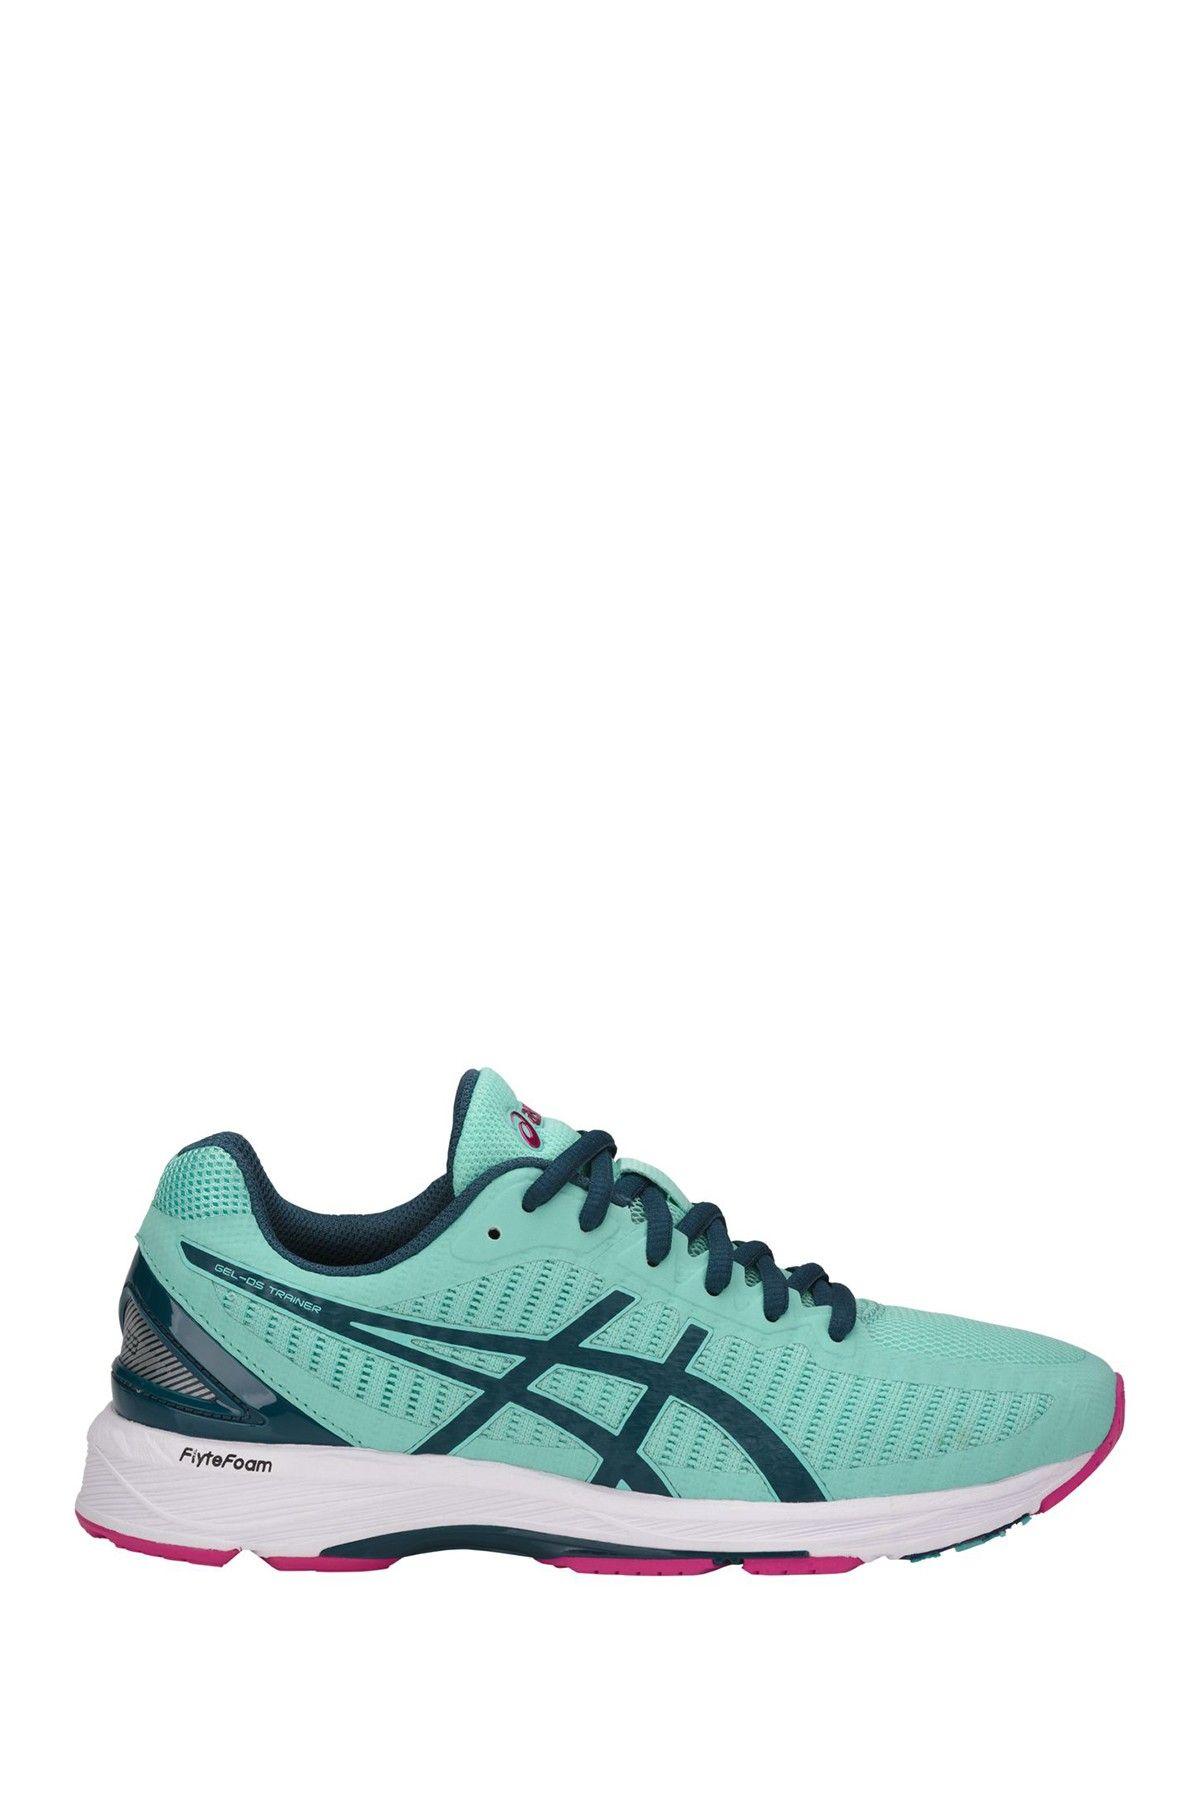 pretty nice 27804 f1e9d GEL-DS Trainer 23 Sneaker | My Closet | Sneakers, Asics ...